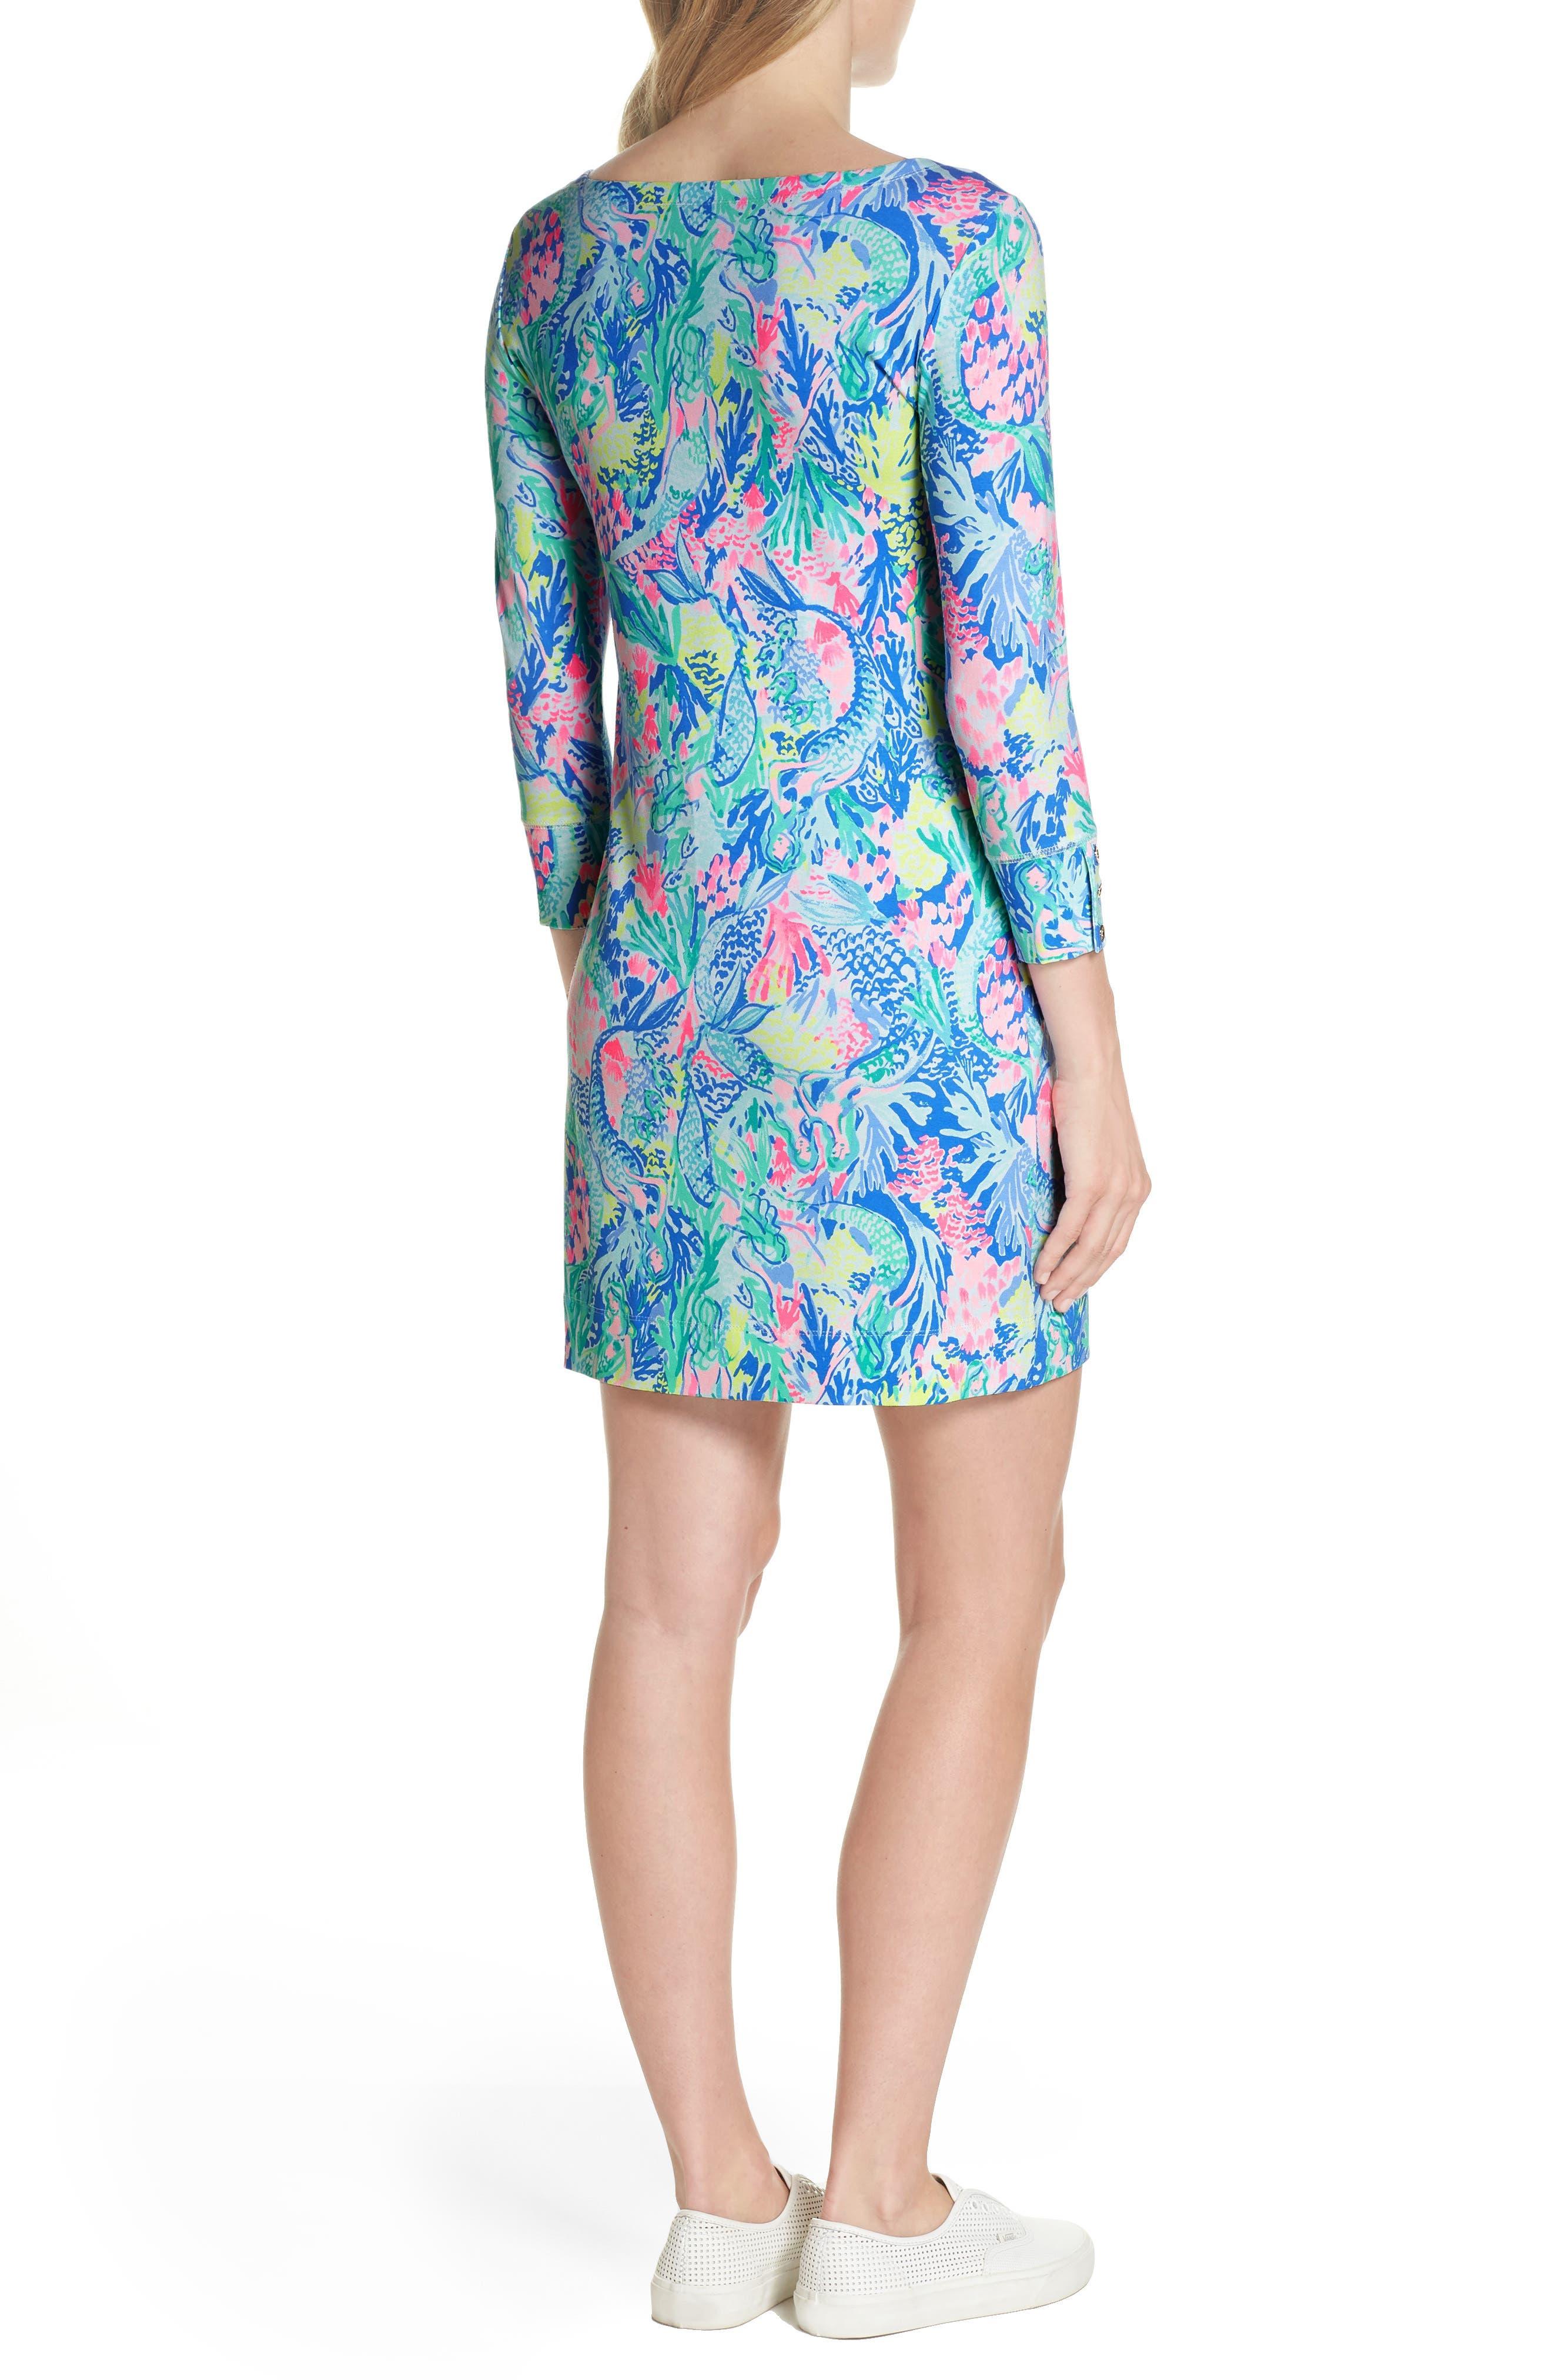 Sophie UPF 50+ Shift Dress,                             Alternate thumbnail 2, color,                             Multi Mermaids Cove